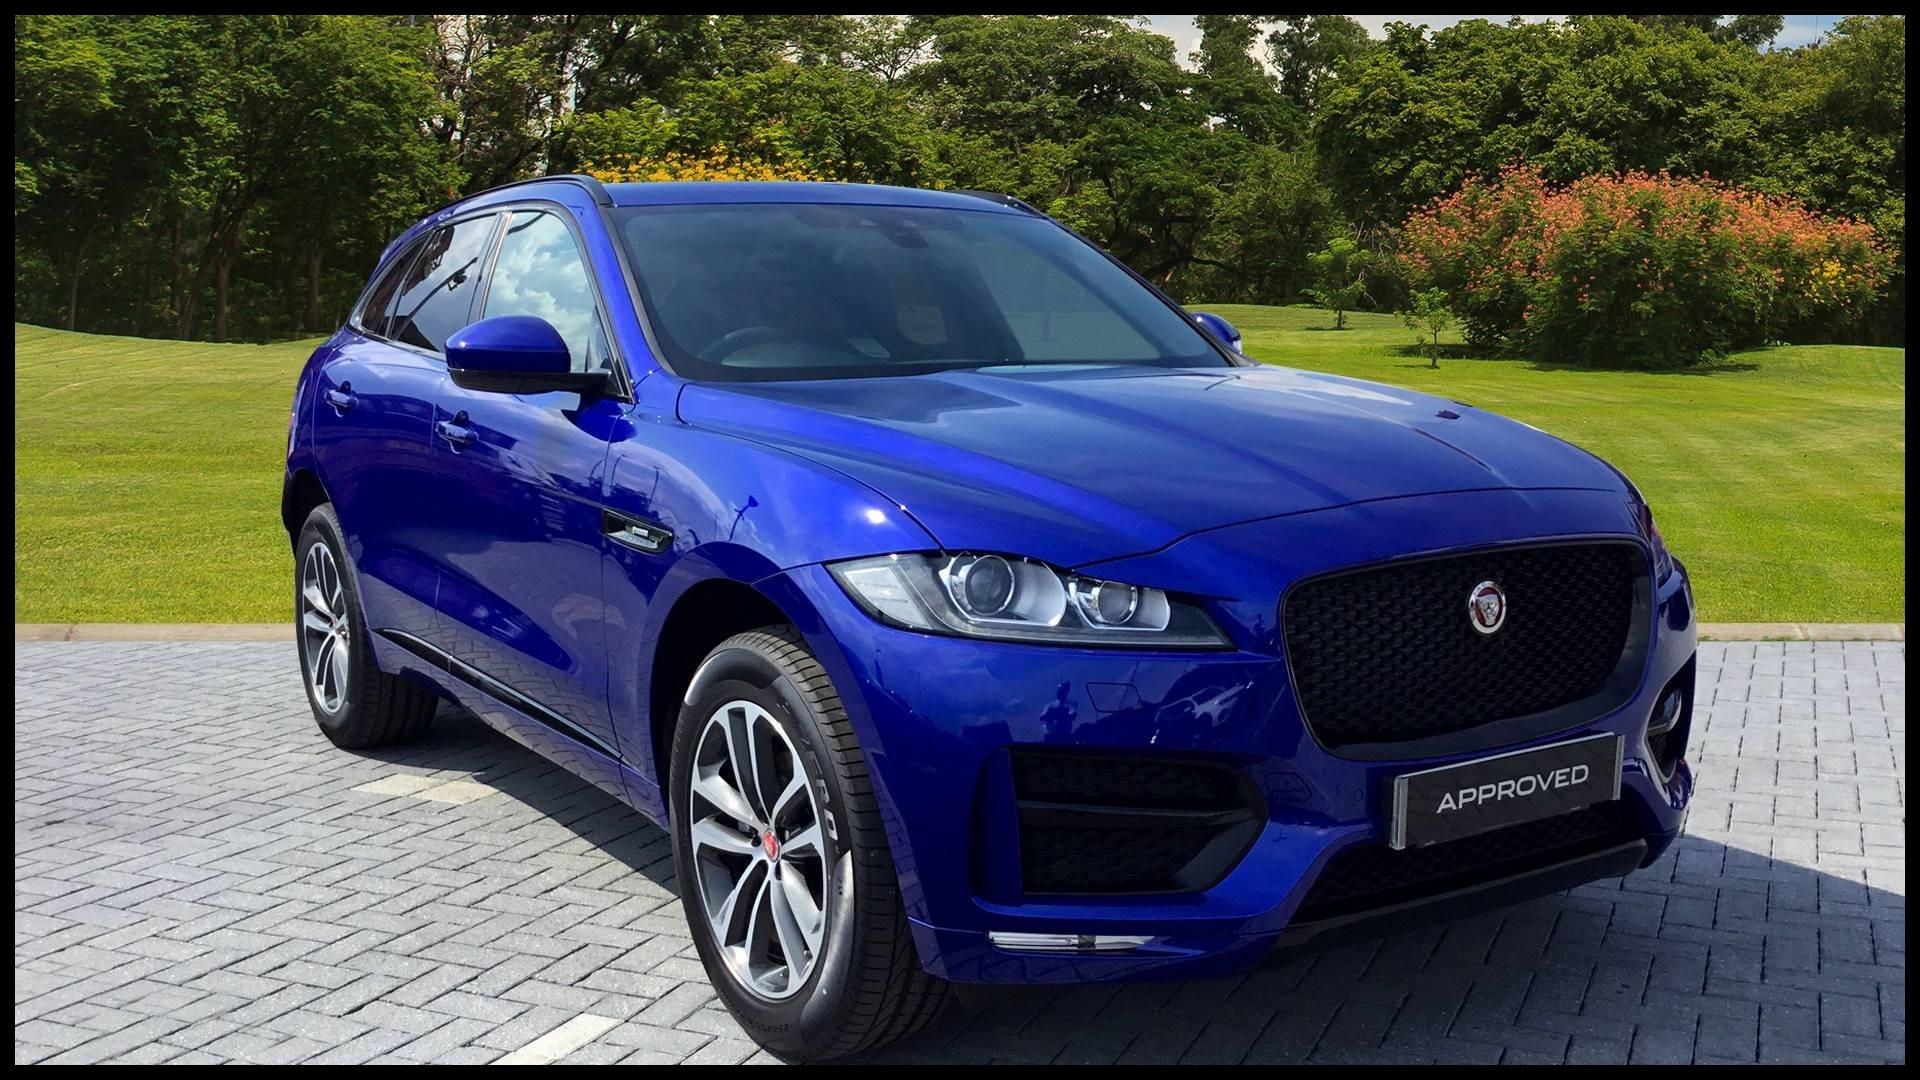 Used Car Warranty New Beautiful Used Car Warranty Template Elegant Used Jaguar F Pace 2 0d